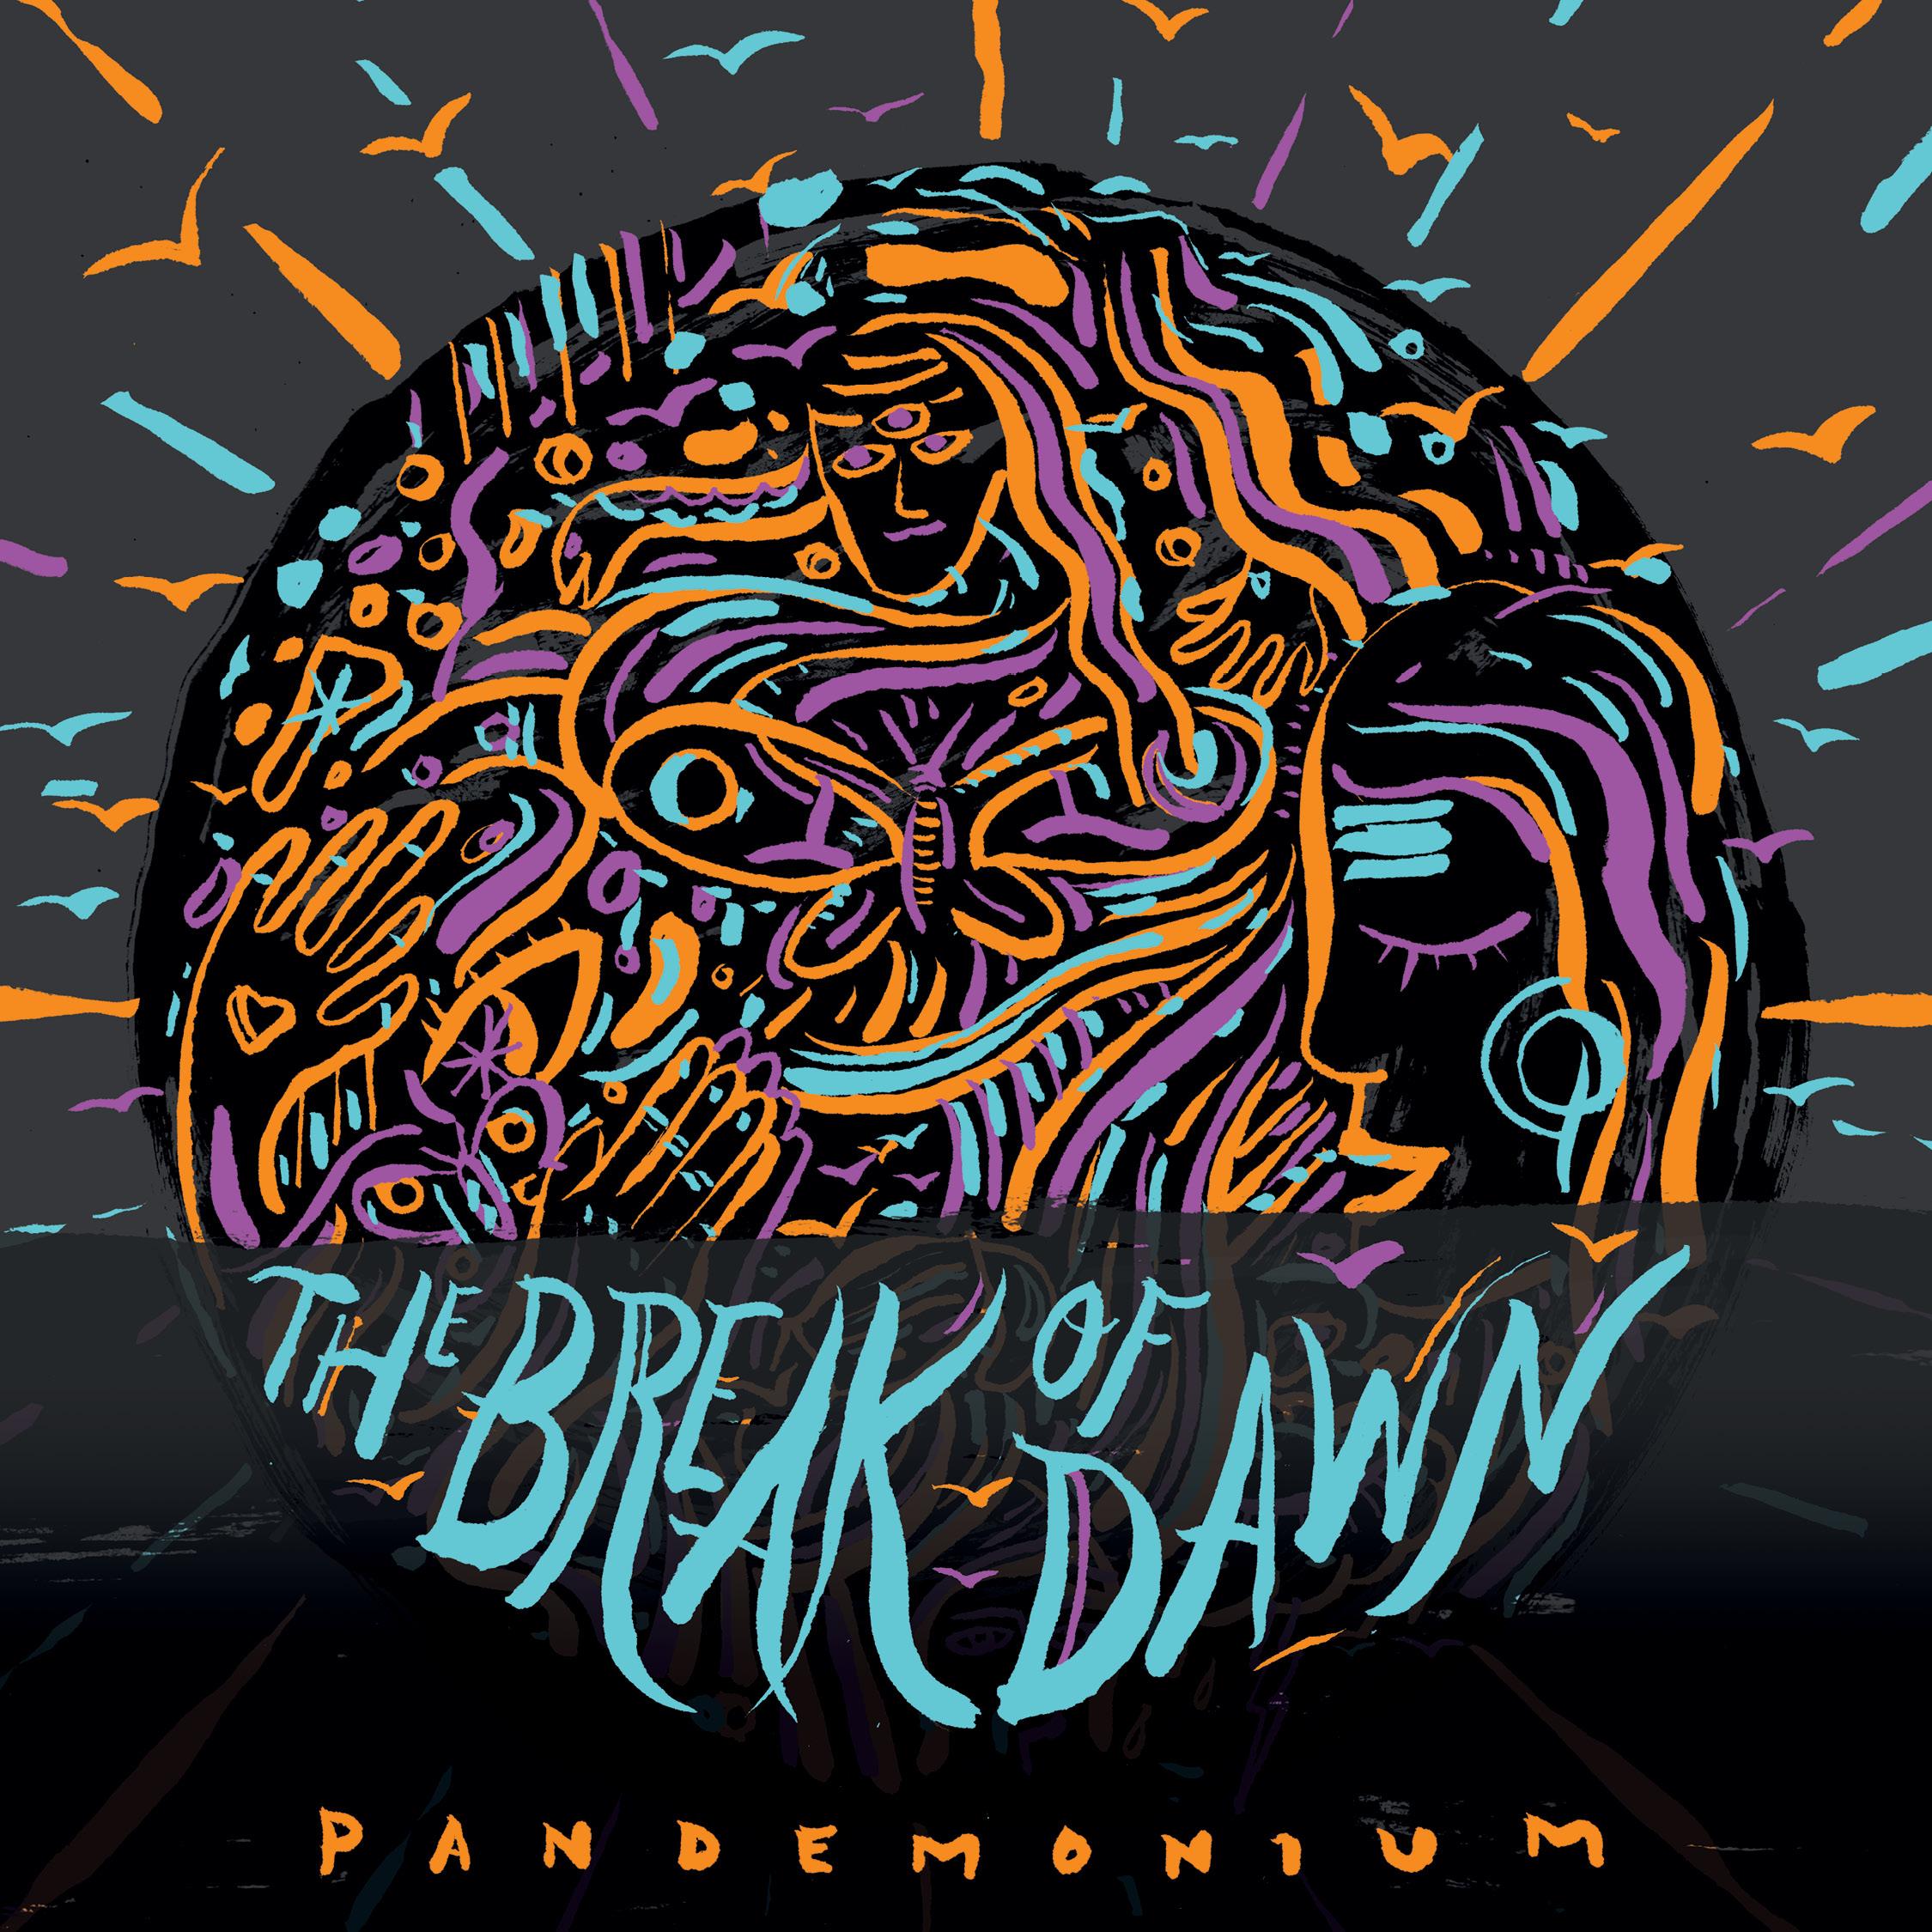 540_Break of Dawn